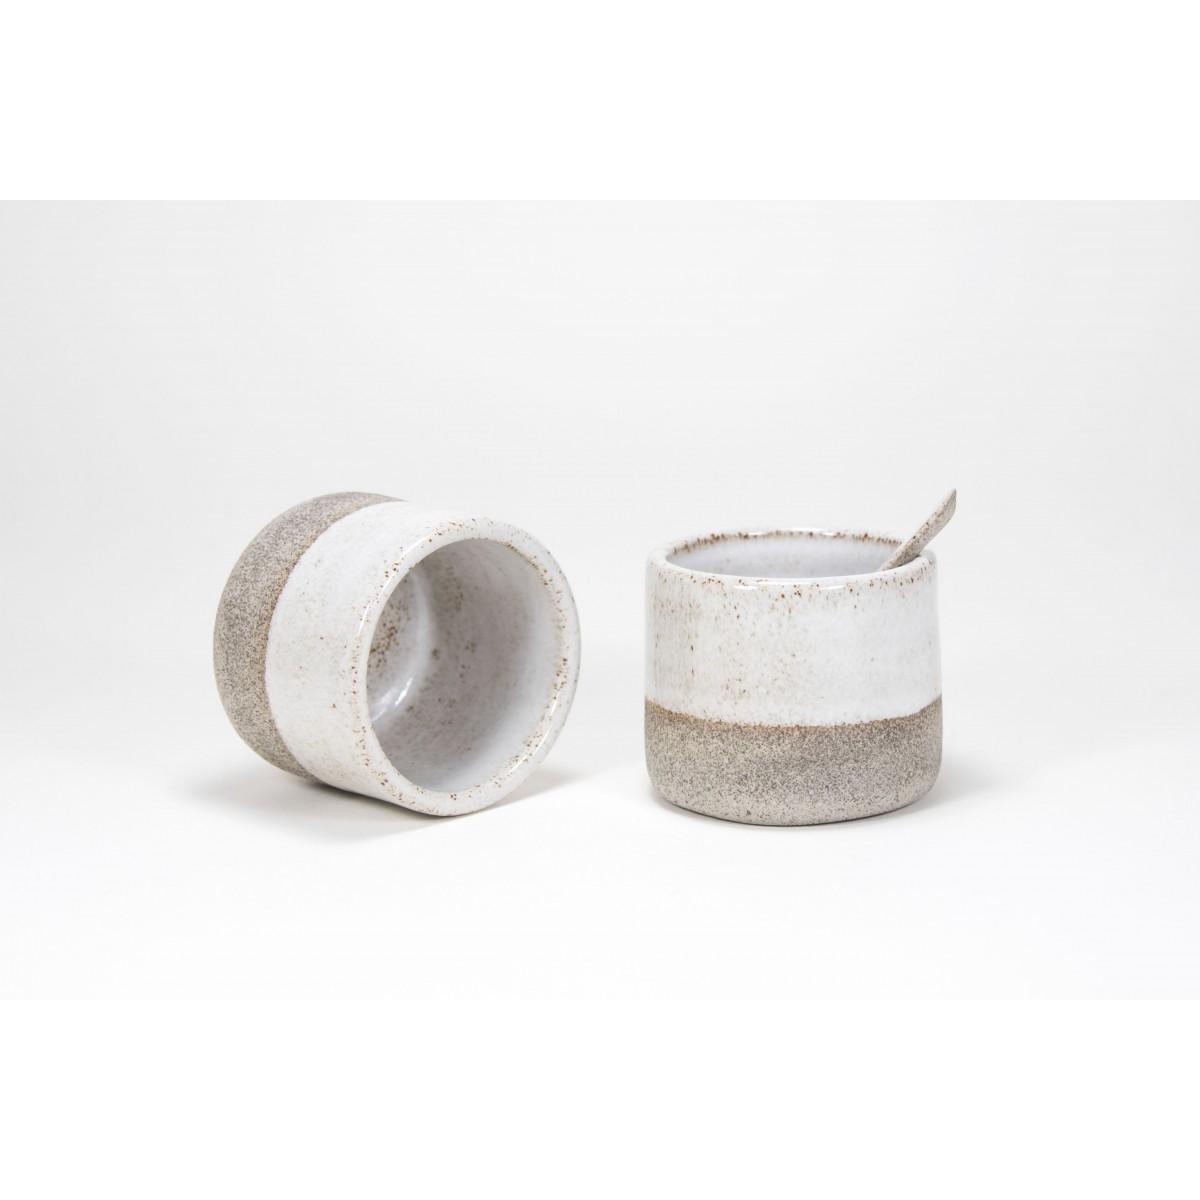 BET - handgemachter Espressobecher oder Gefäß aus Keramik betongrau/weiß - Anita Riesch